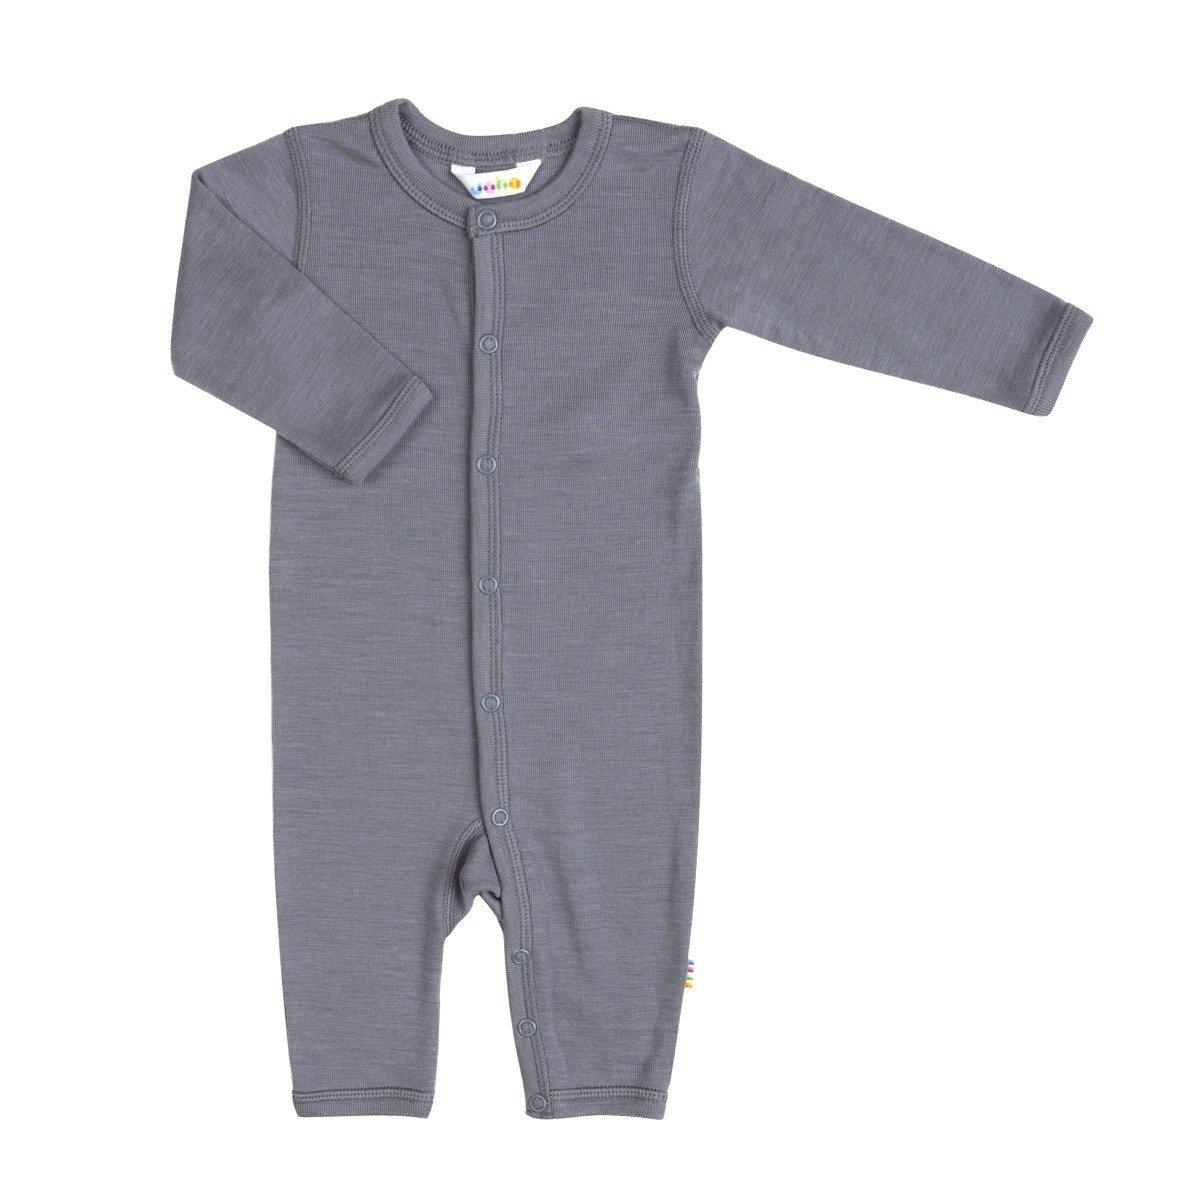 Joha uld/silke heldragt i grå